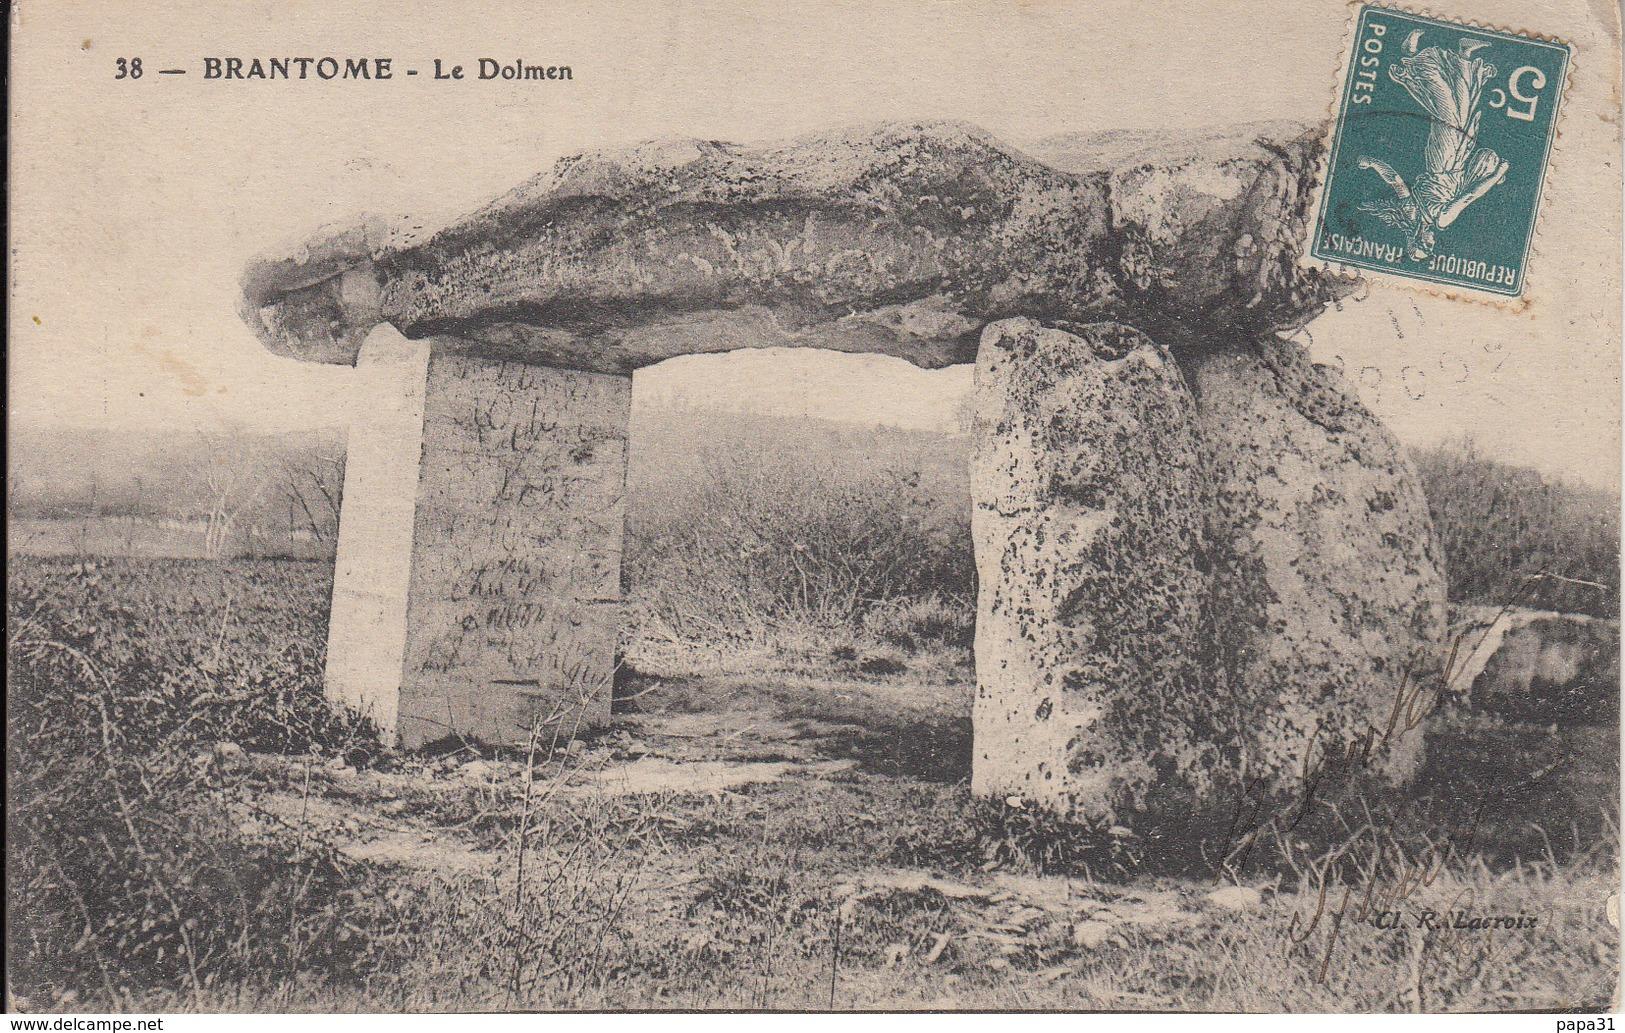 BRANTOME Le Dolmen - Dolmen & Menhirs